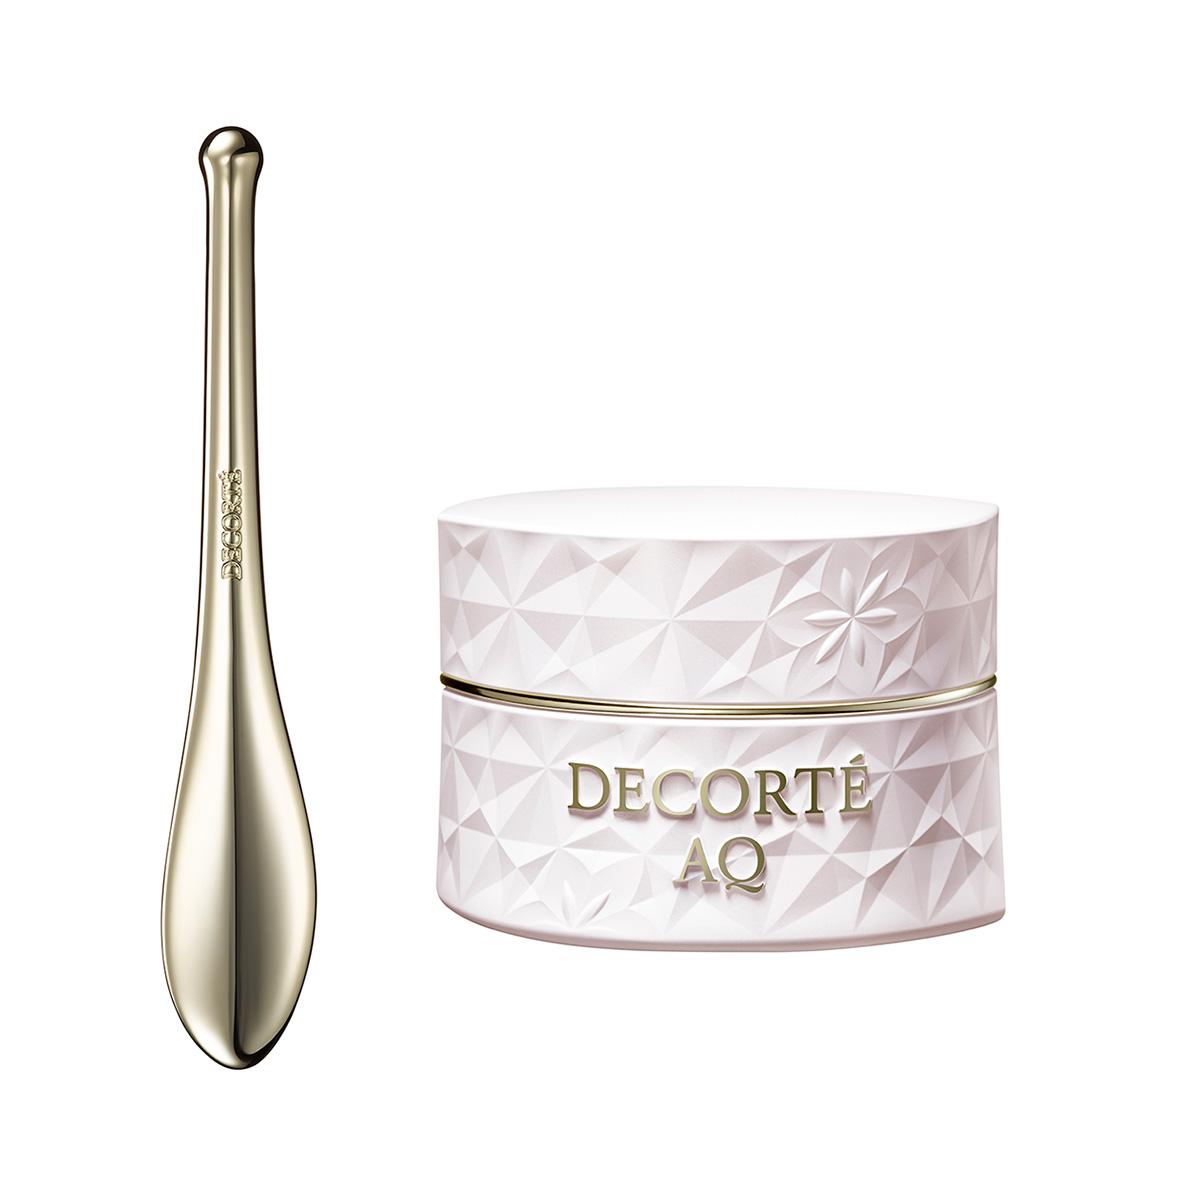 DECORTÉ AQ コンセントレイト ネック クリーム / オリジナル コンセントレイト マッサージャー付 98g ¥16,500 (4月16日発売)